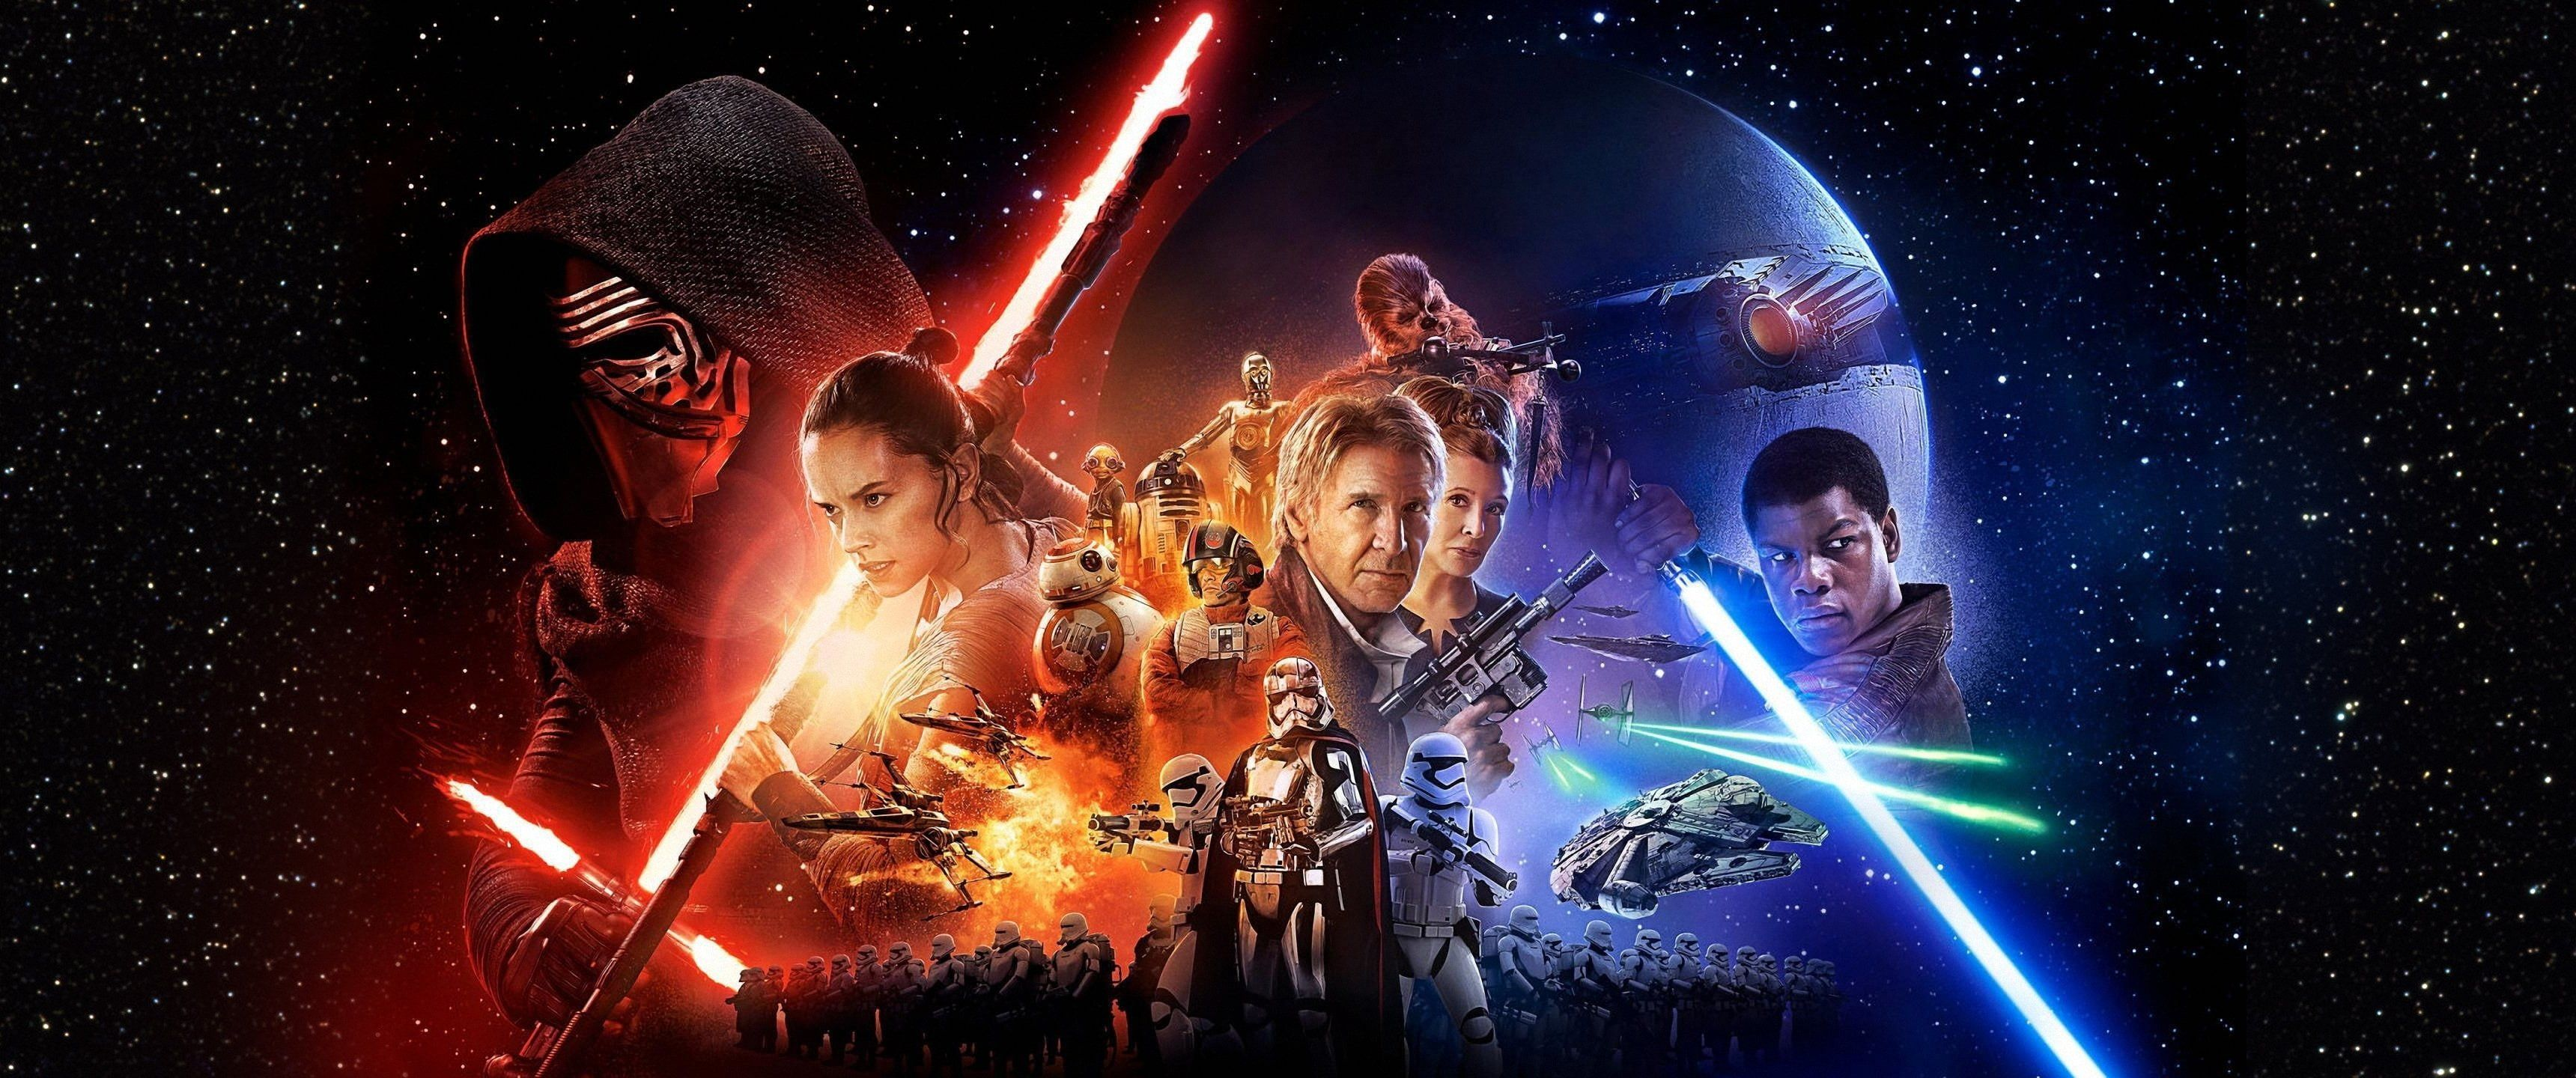 3440x1440 Px Action Adventure Awakens Disney Fi Fighting Force Futuristic Sci Star Wars 2k Wallpaper Hdwa Star Wars Wallpaper Star Wars Wallpaper